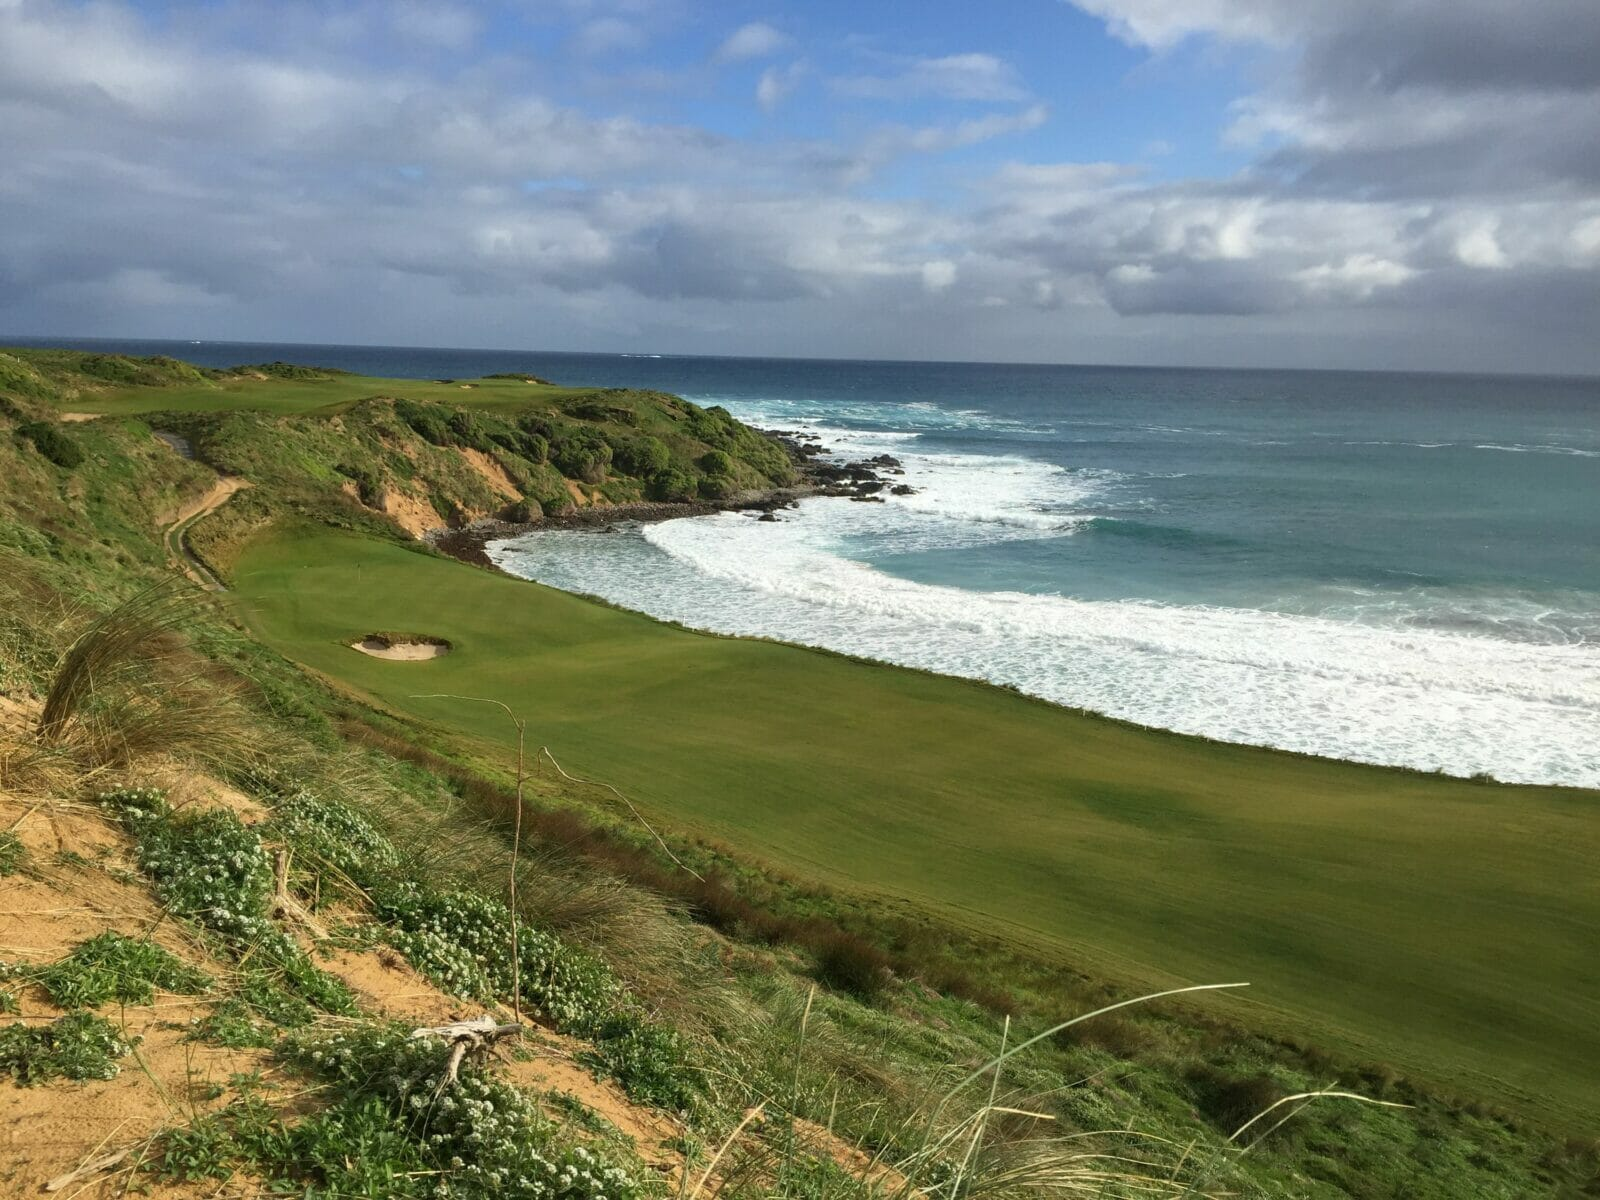 Cape Wickham golf course adjacent to Bass Strait